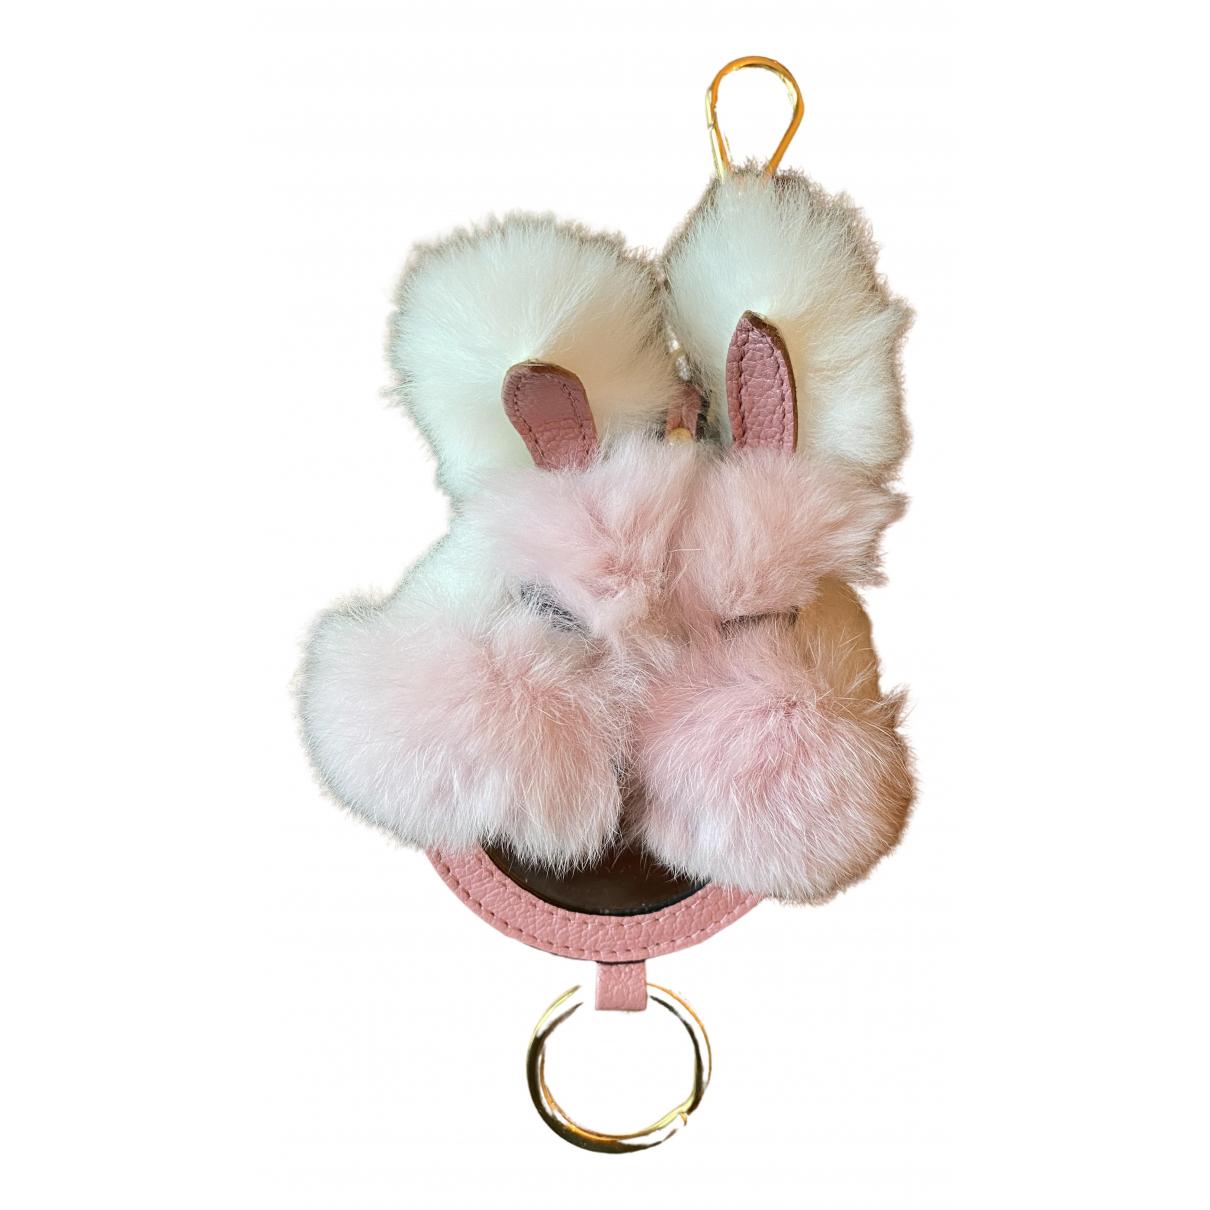 Miu Miu - Bijoux de sac   pour femme en lapin - multicolore